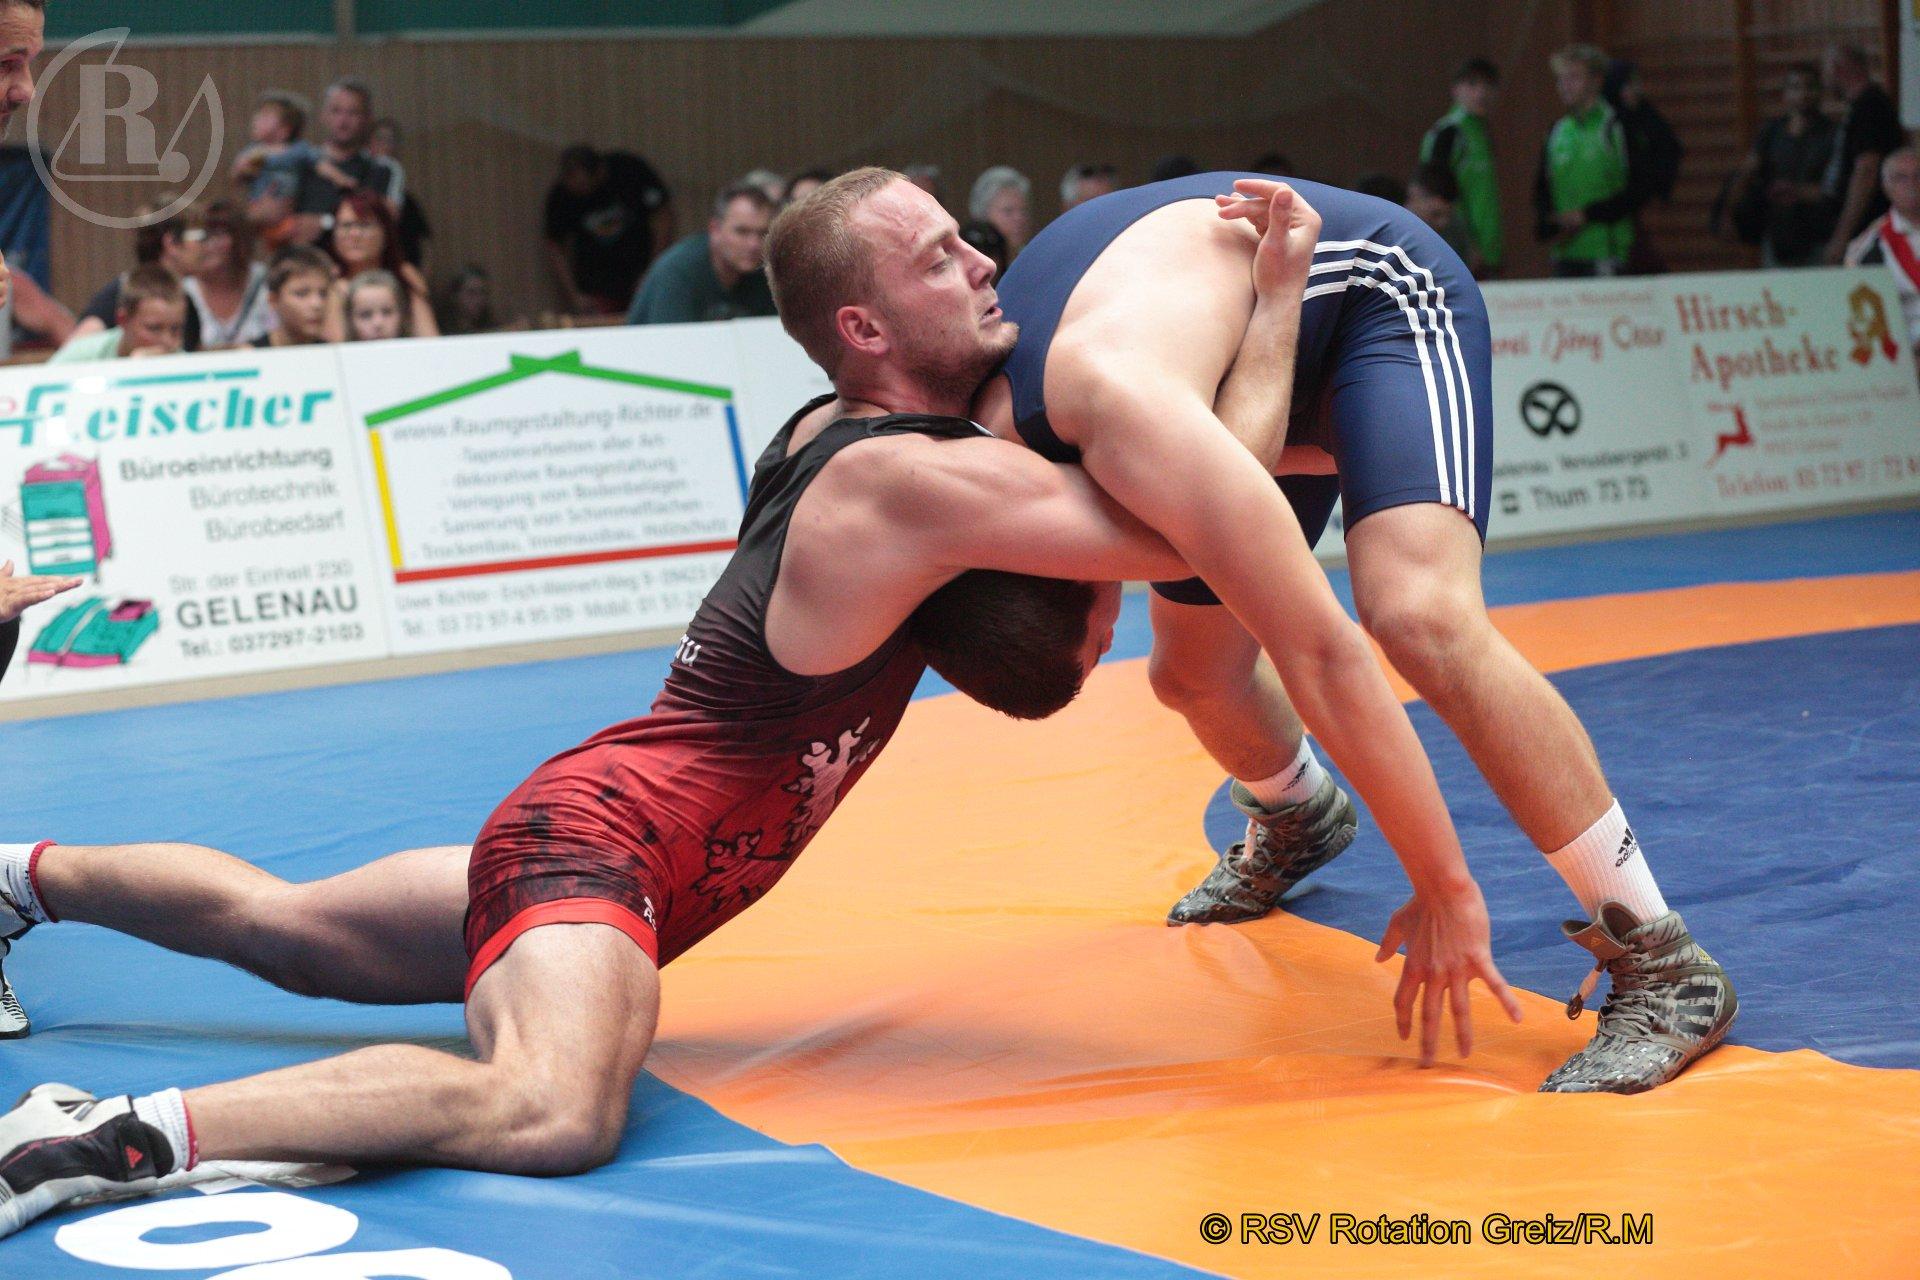 87 kg Freistil: Kästel, Lucas, WKG Gelenau II/Chemnitz gegen Opiela, Nori (blaues Trikot), RSV Rotation Greiz II - 0:2/PS/1:5/06:00